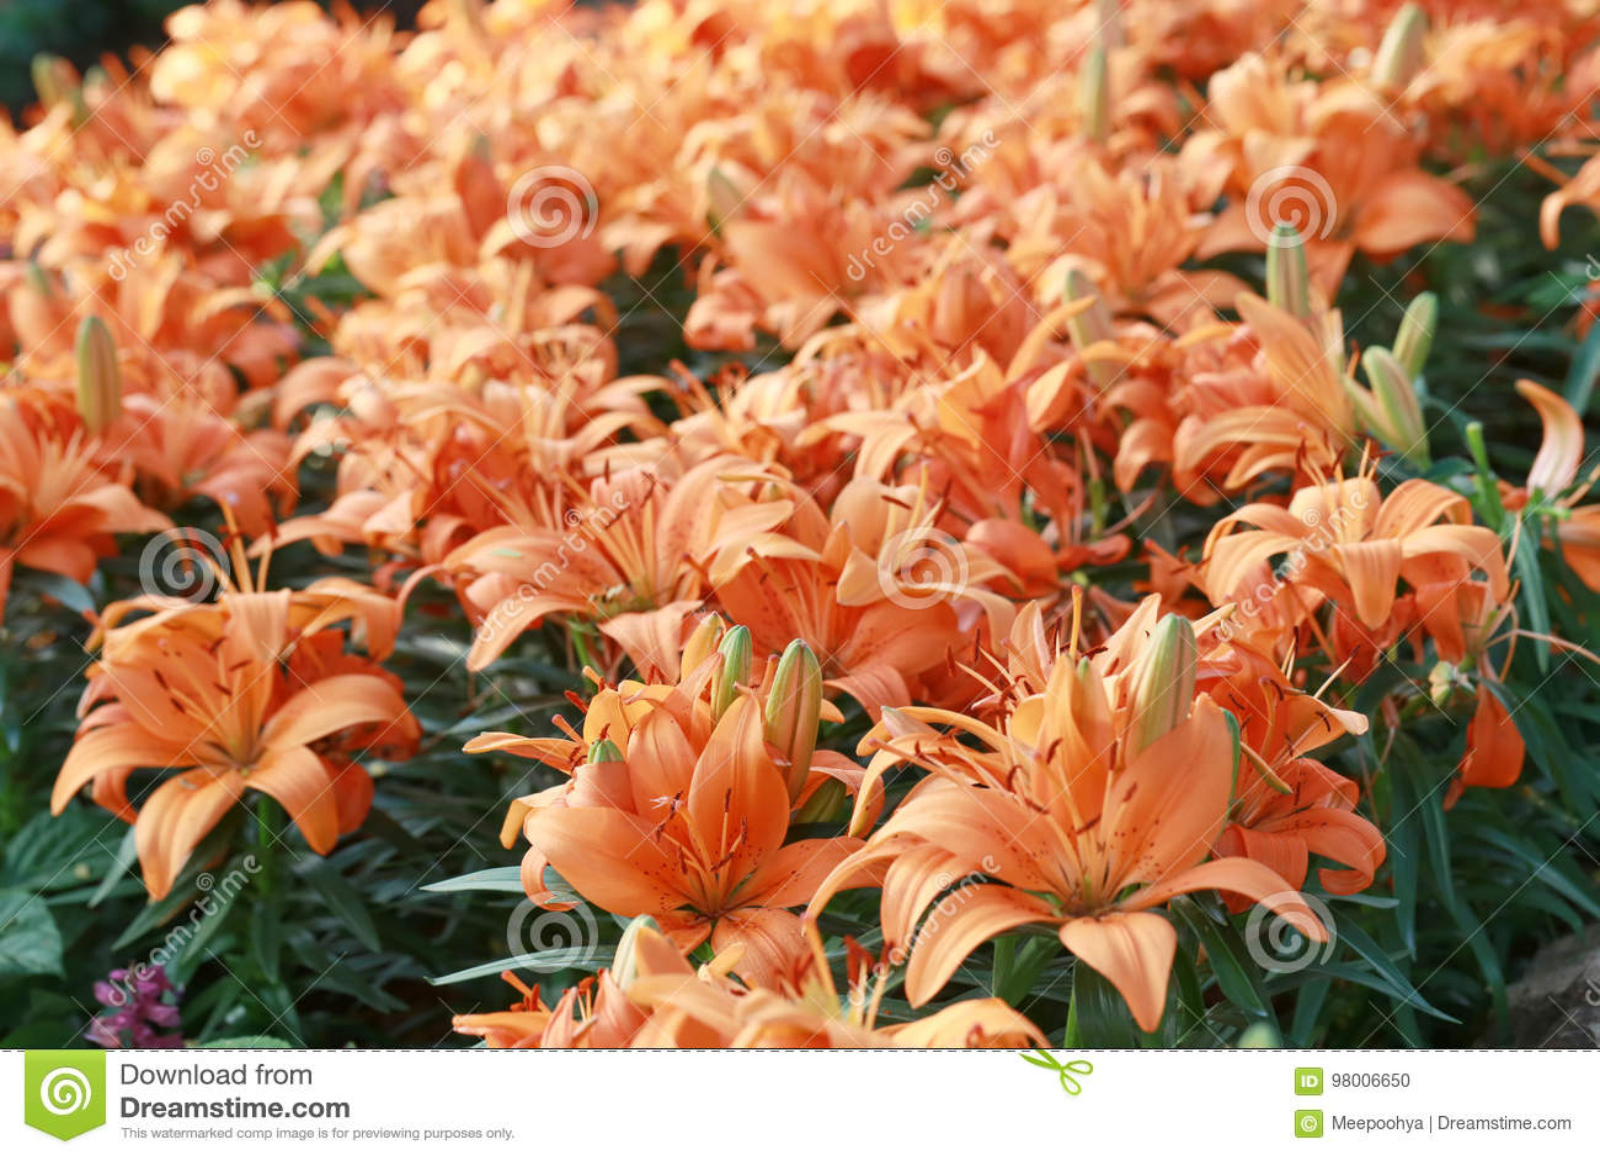 94394d173c6a4 Lily Flower Of Orange Color Bloom. Stock Photo - Image of orange ...